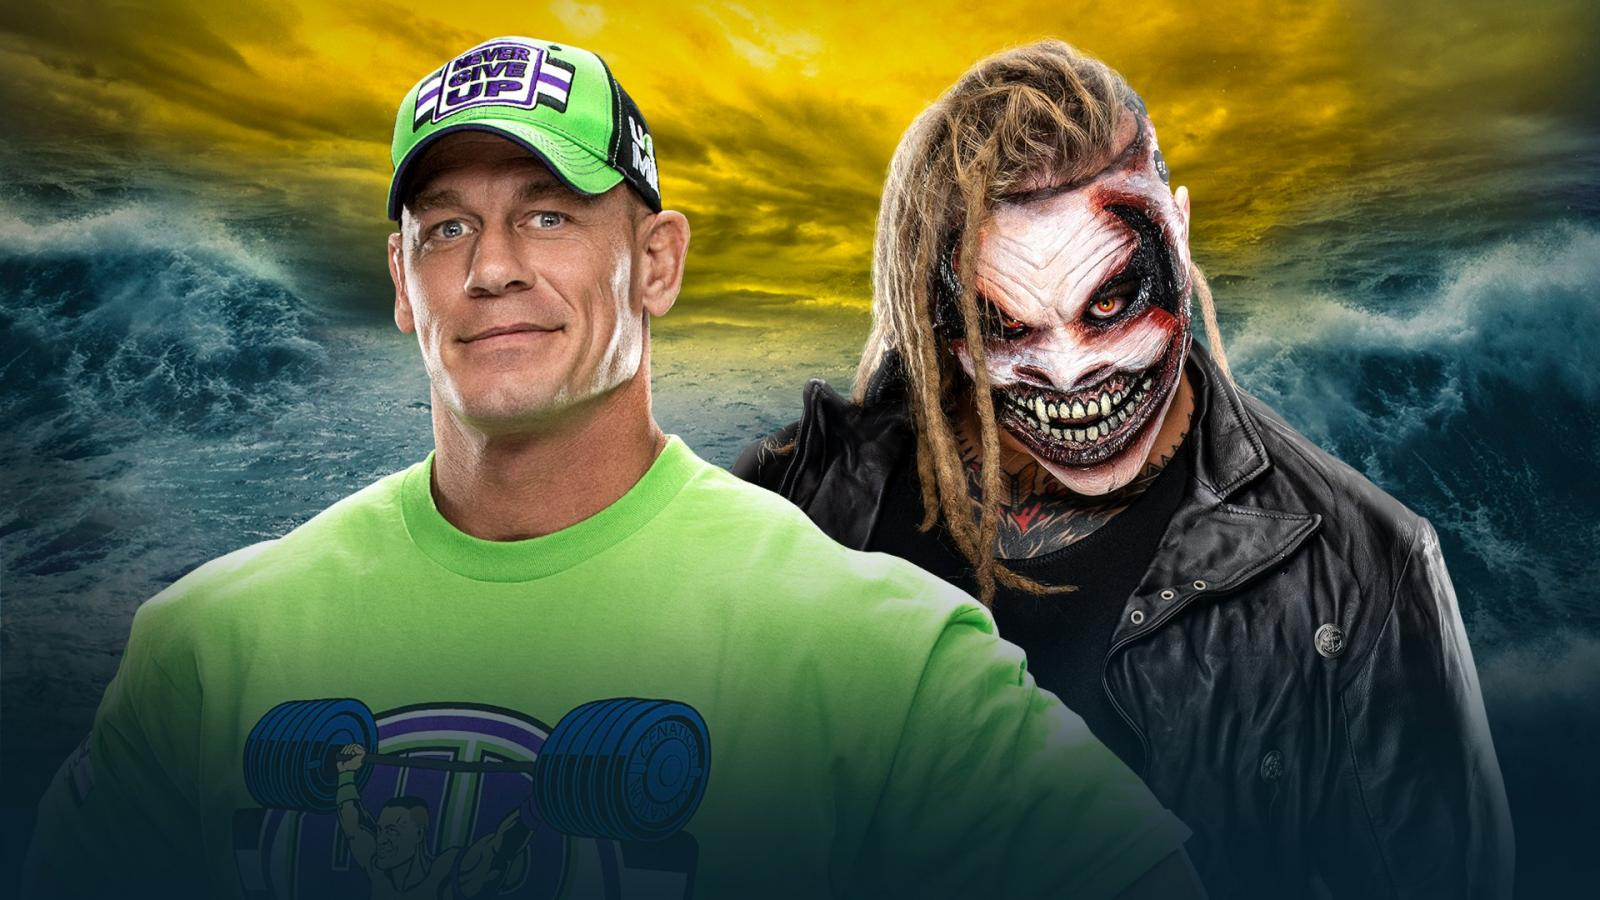 John-Cena-vs.-The-Fiend-Bray-Wyatt